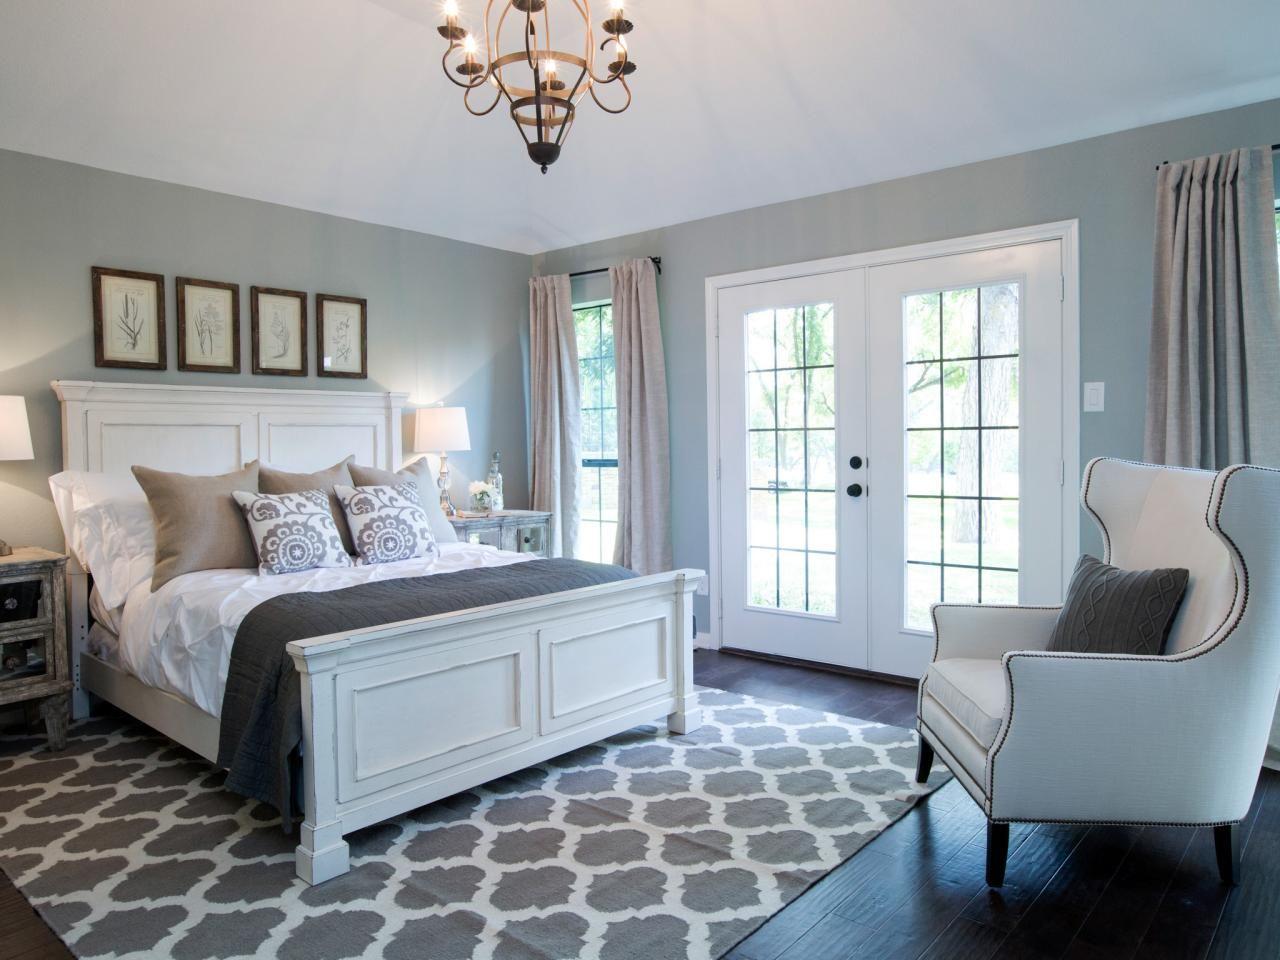 Best 25 Blue master bedroom ideas on Pinterest  Blue bedrooms Blue bedroom and Blue bedroom